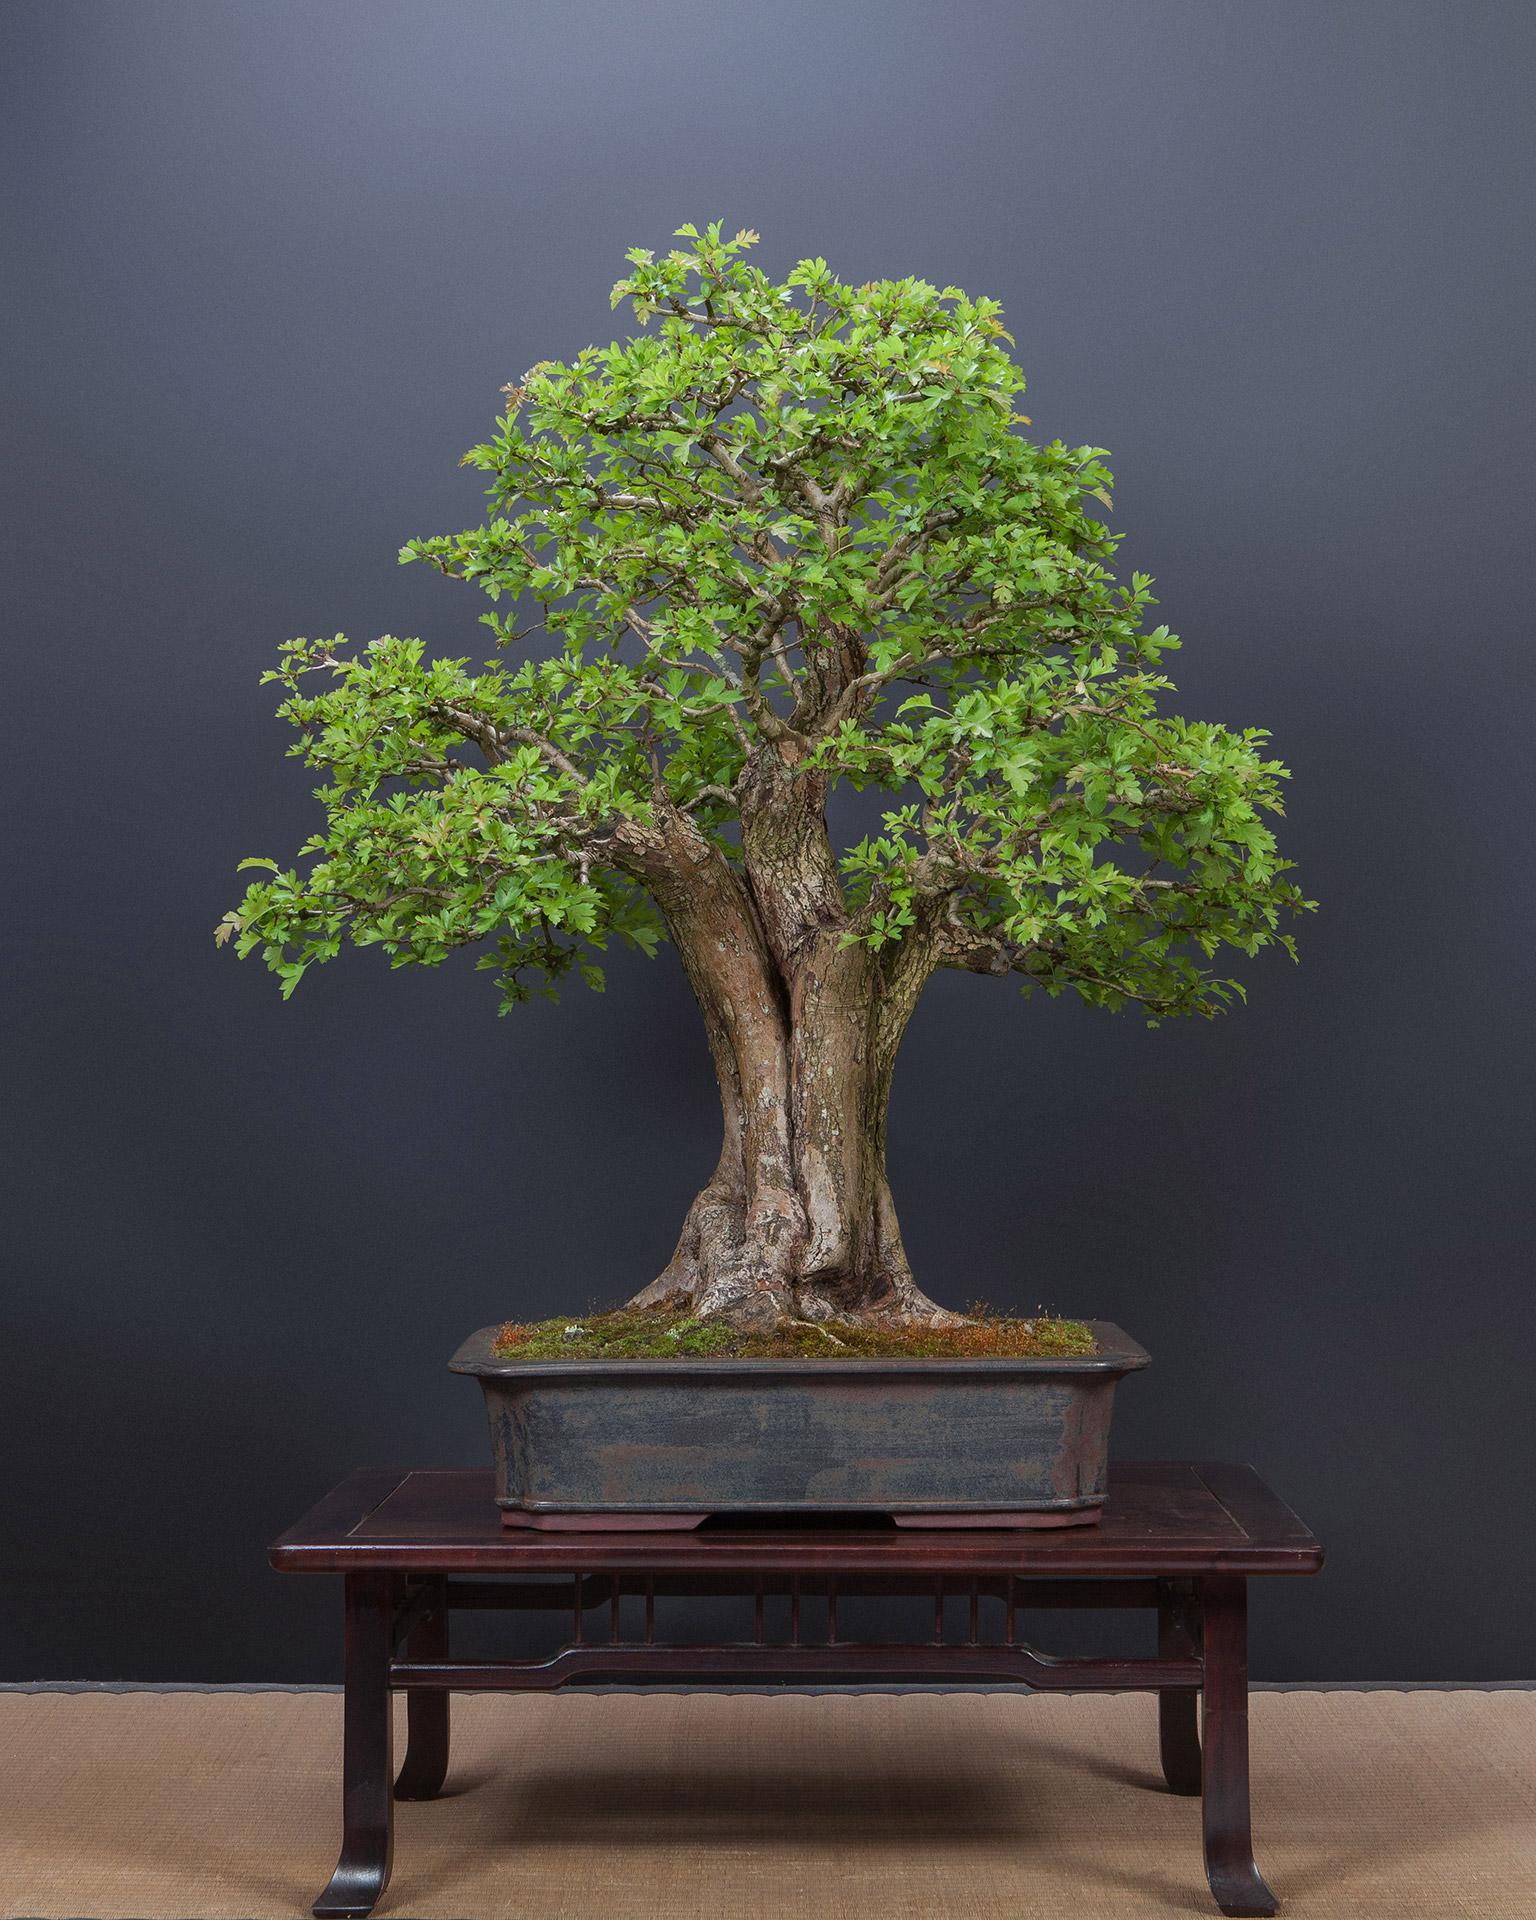 bonsaibaum 025 bonsai werkstatt. Black Bedroom Furniture Sets. Home Design Ideas